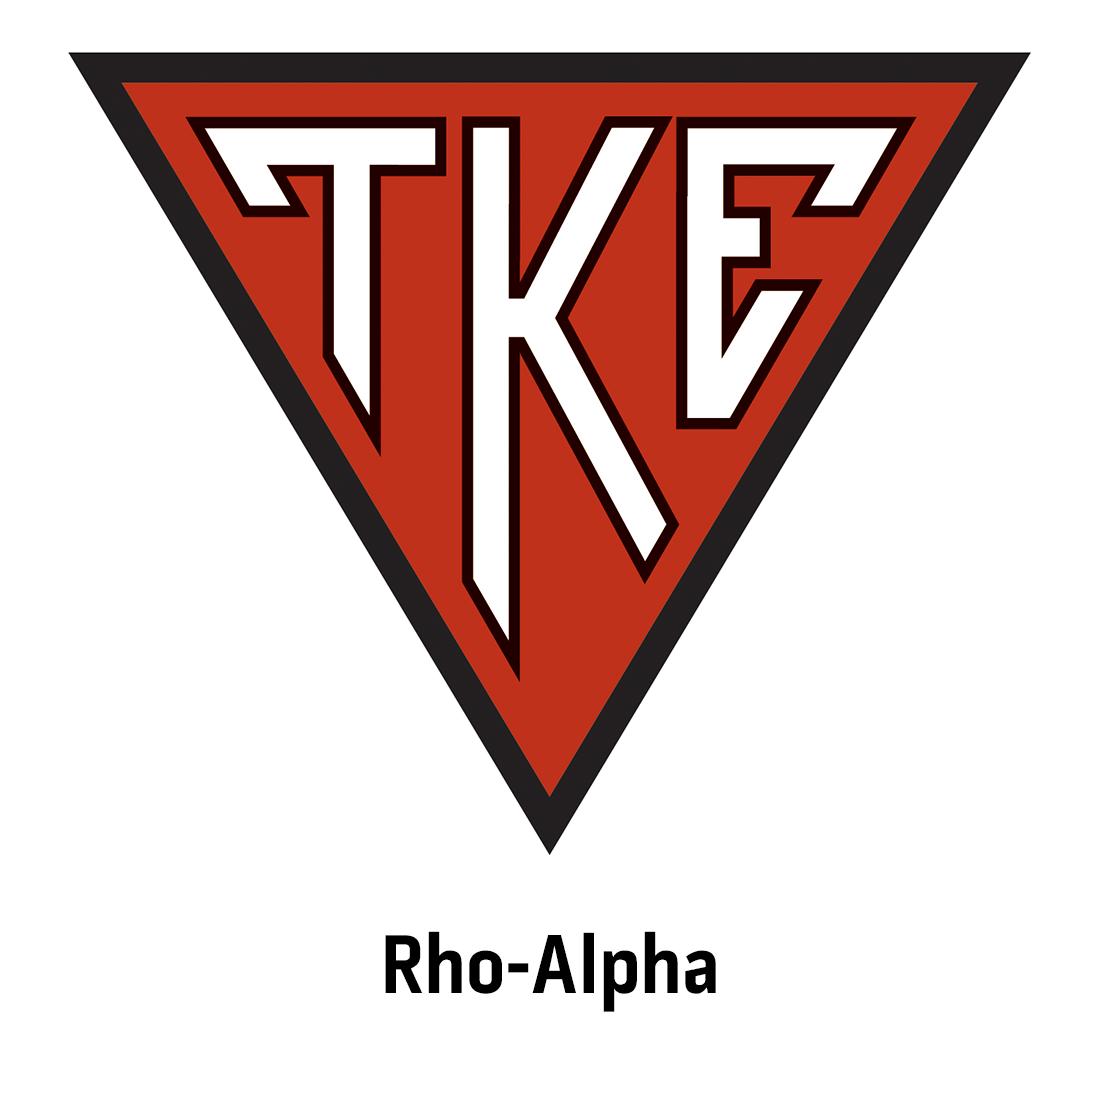 Rho-Alpha Chapter at Winthrop University